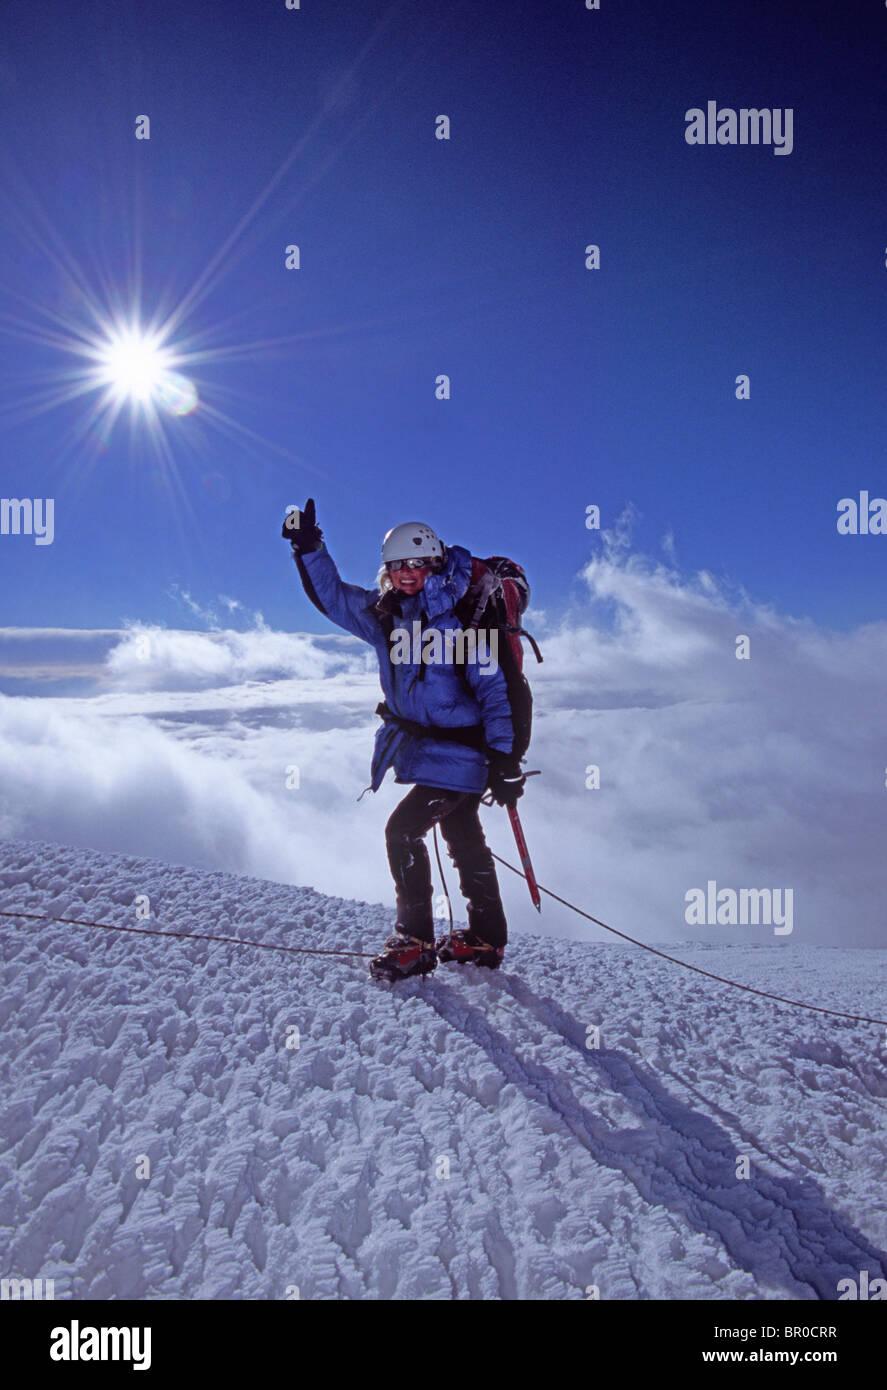 A female mountain climber reaches the summit of Mt. Rainier. Stock Photo